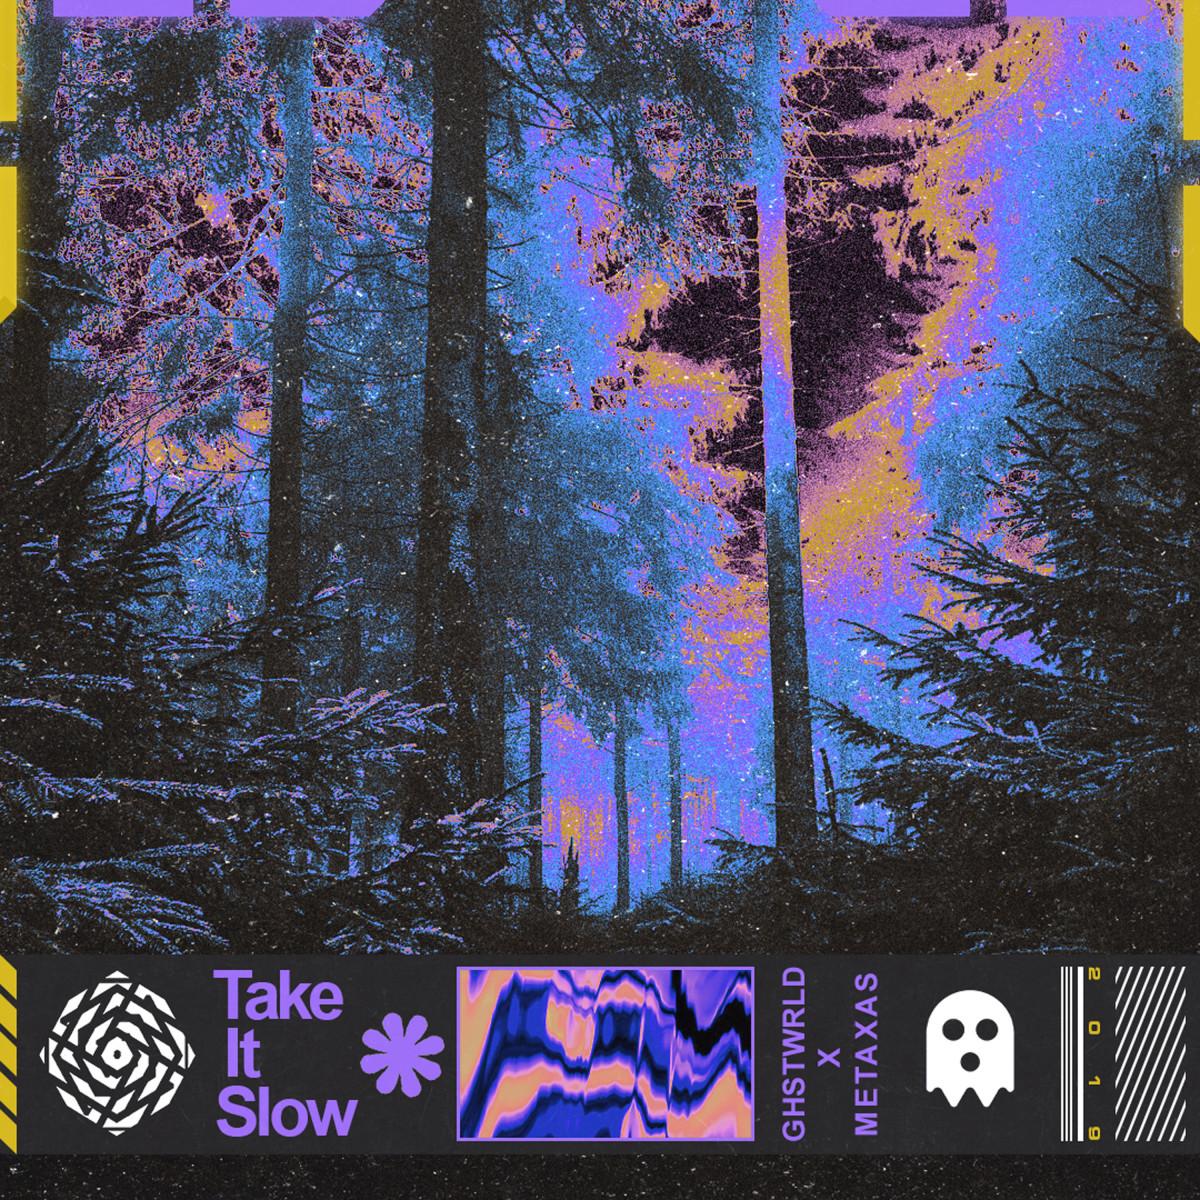 GHSTWRLD x Metaxas - Take It Slow (Artwork)